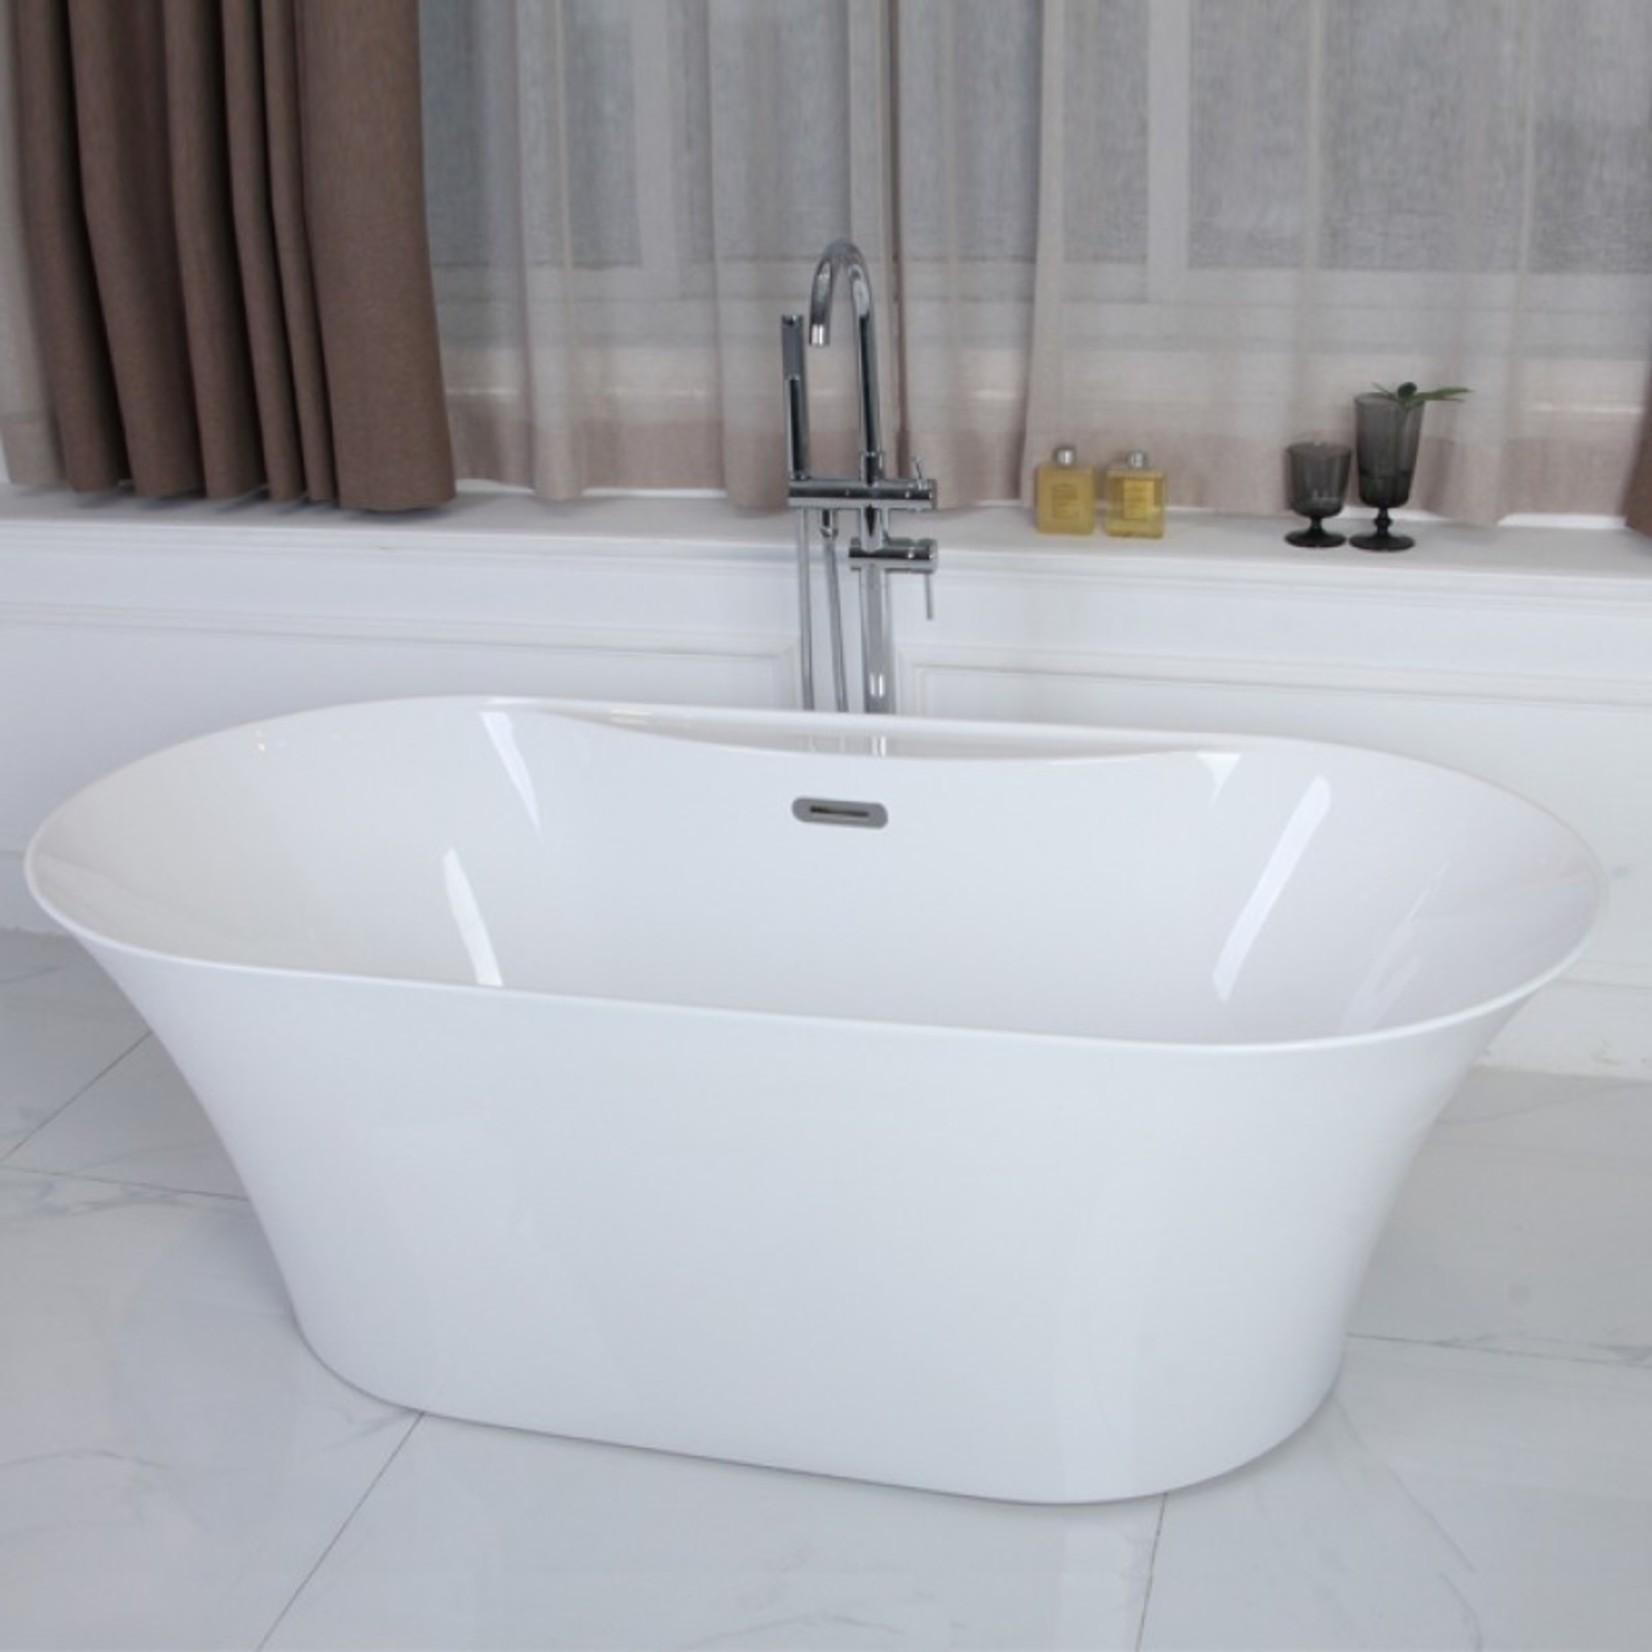 Deluxe Freestanding Bathtub Jenna